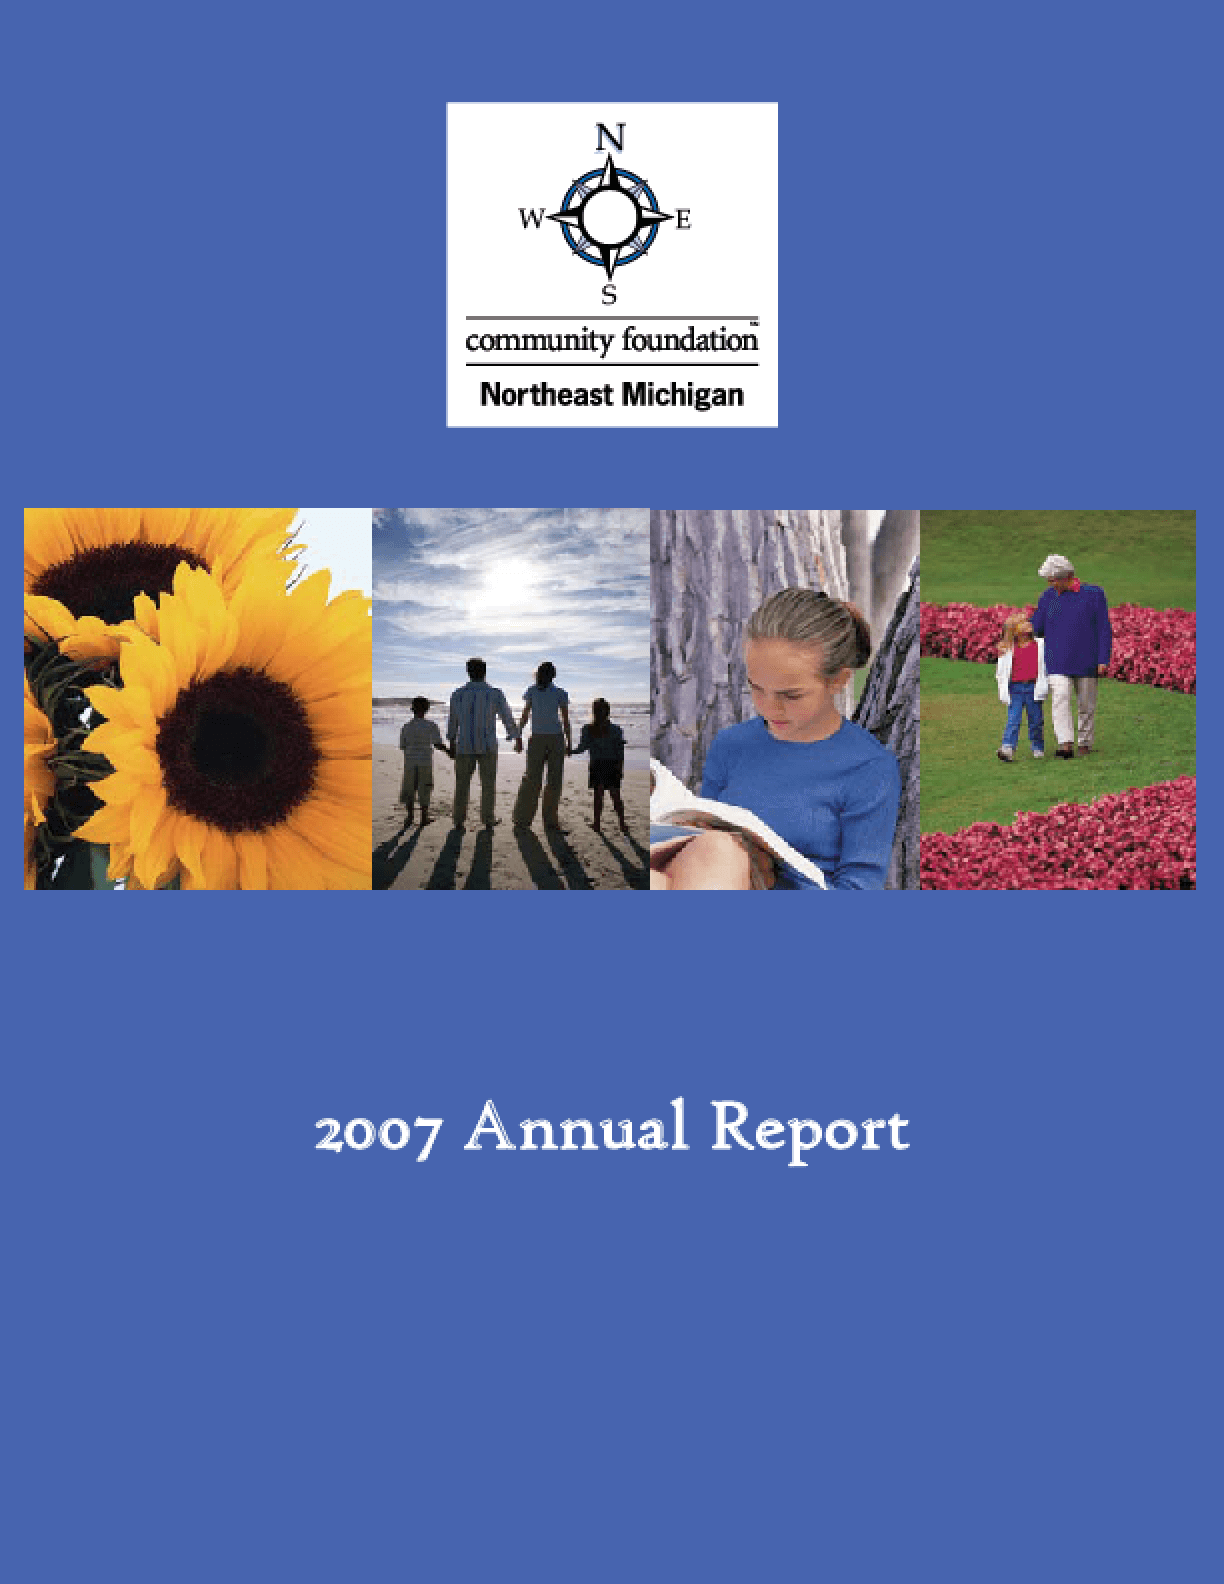 Community Foundation for Northeast Michigan - 2007 Annual Report